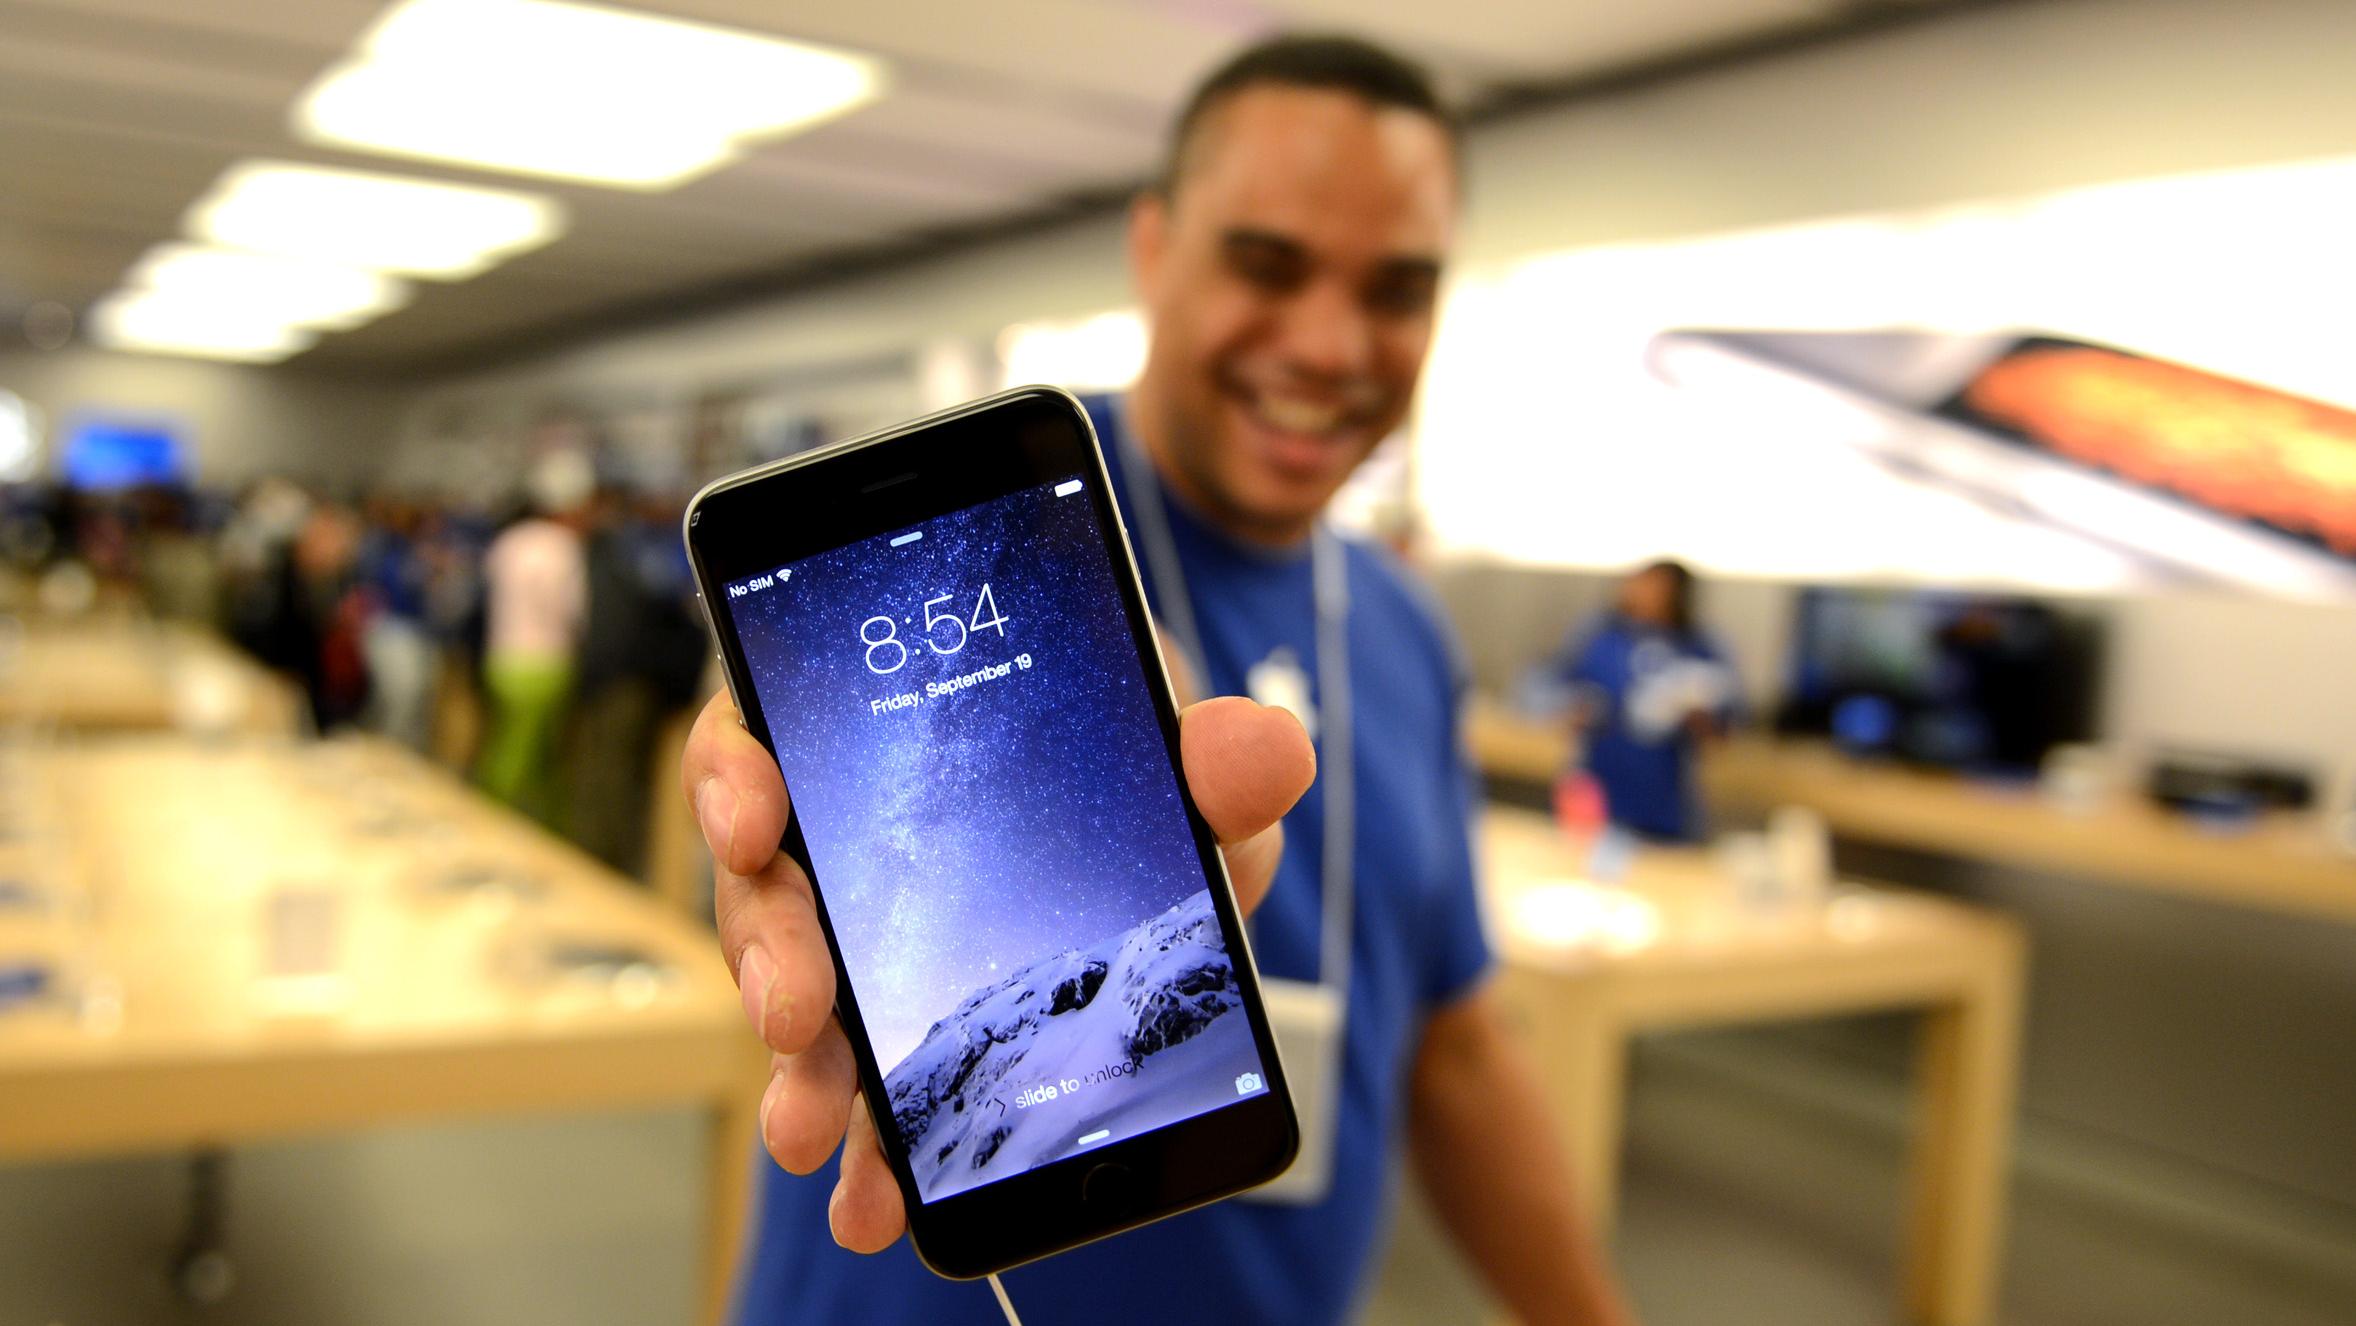 Apple Store medewerker met iPhone 6-16x9